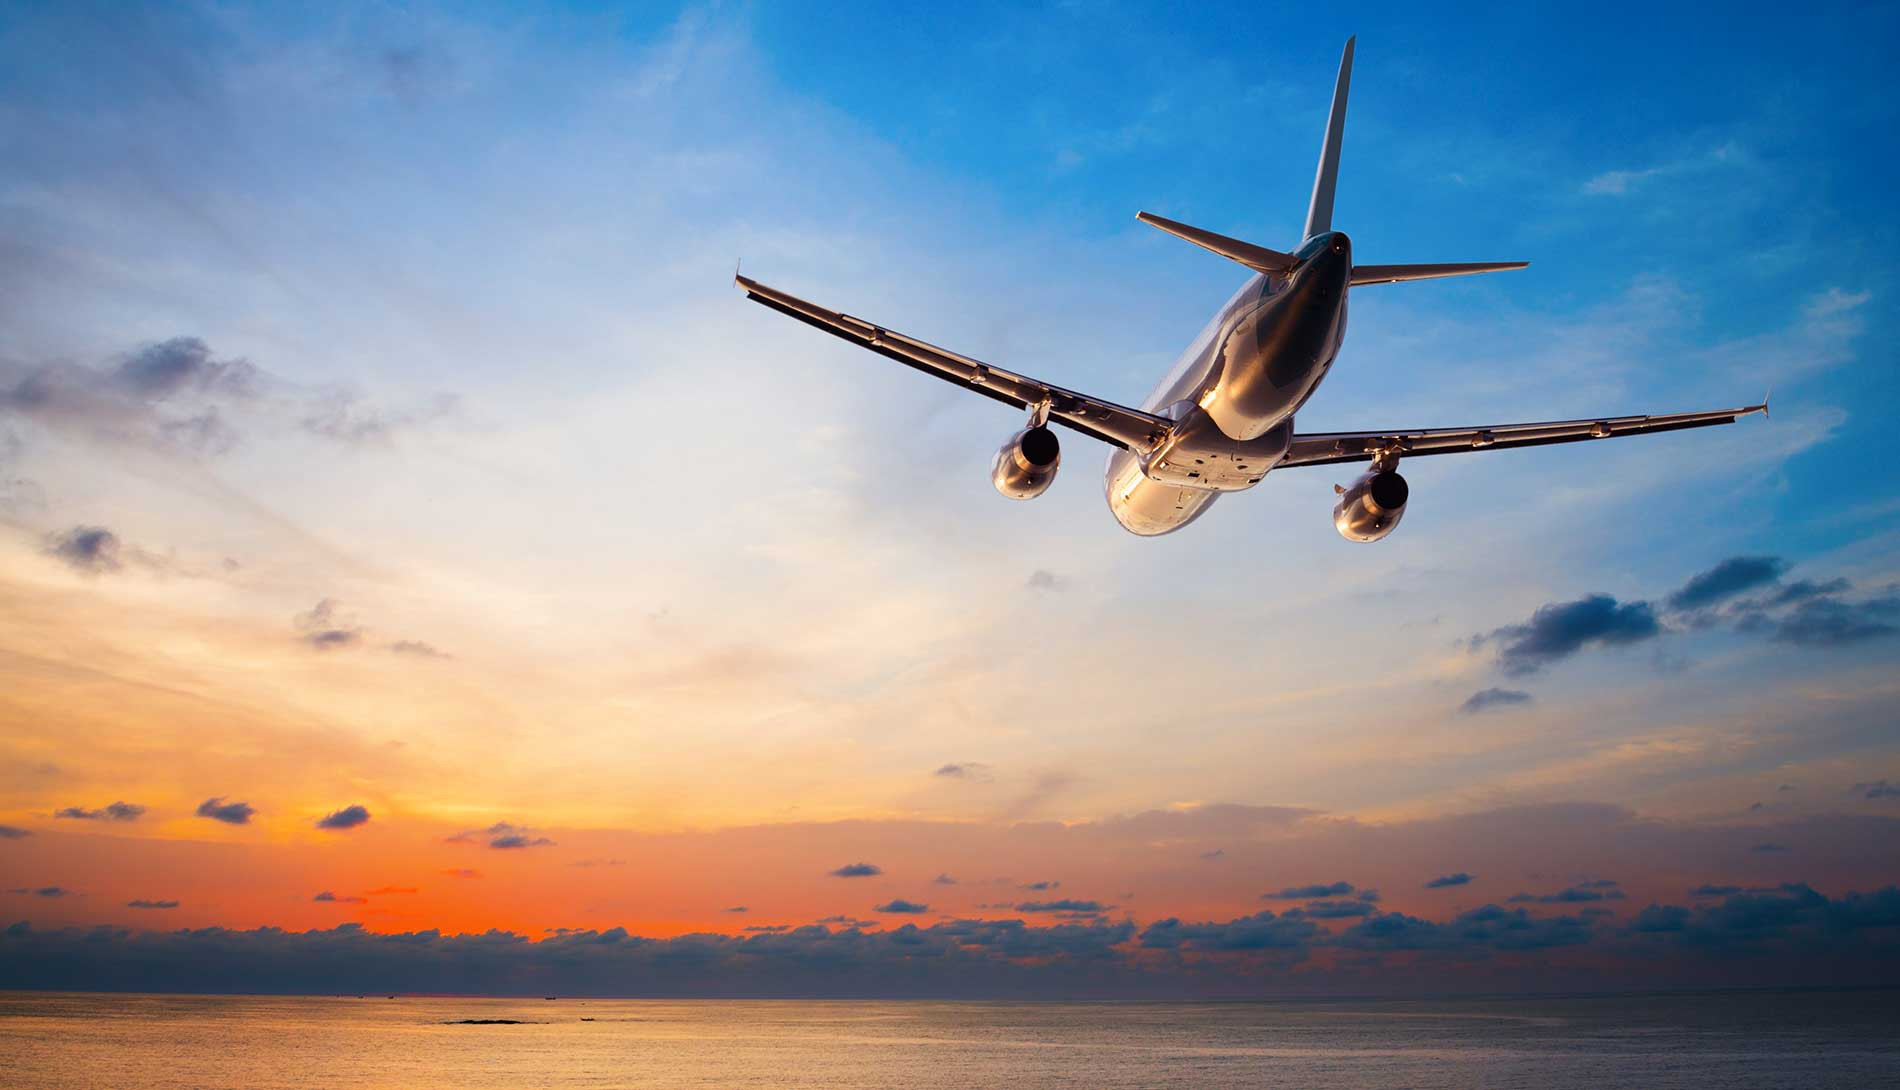 Plane flying during sunset